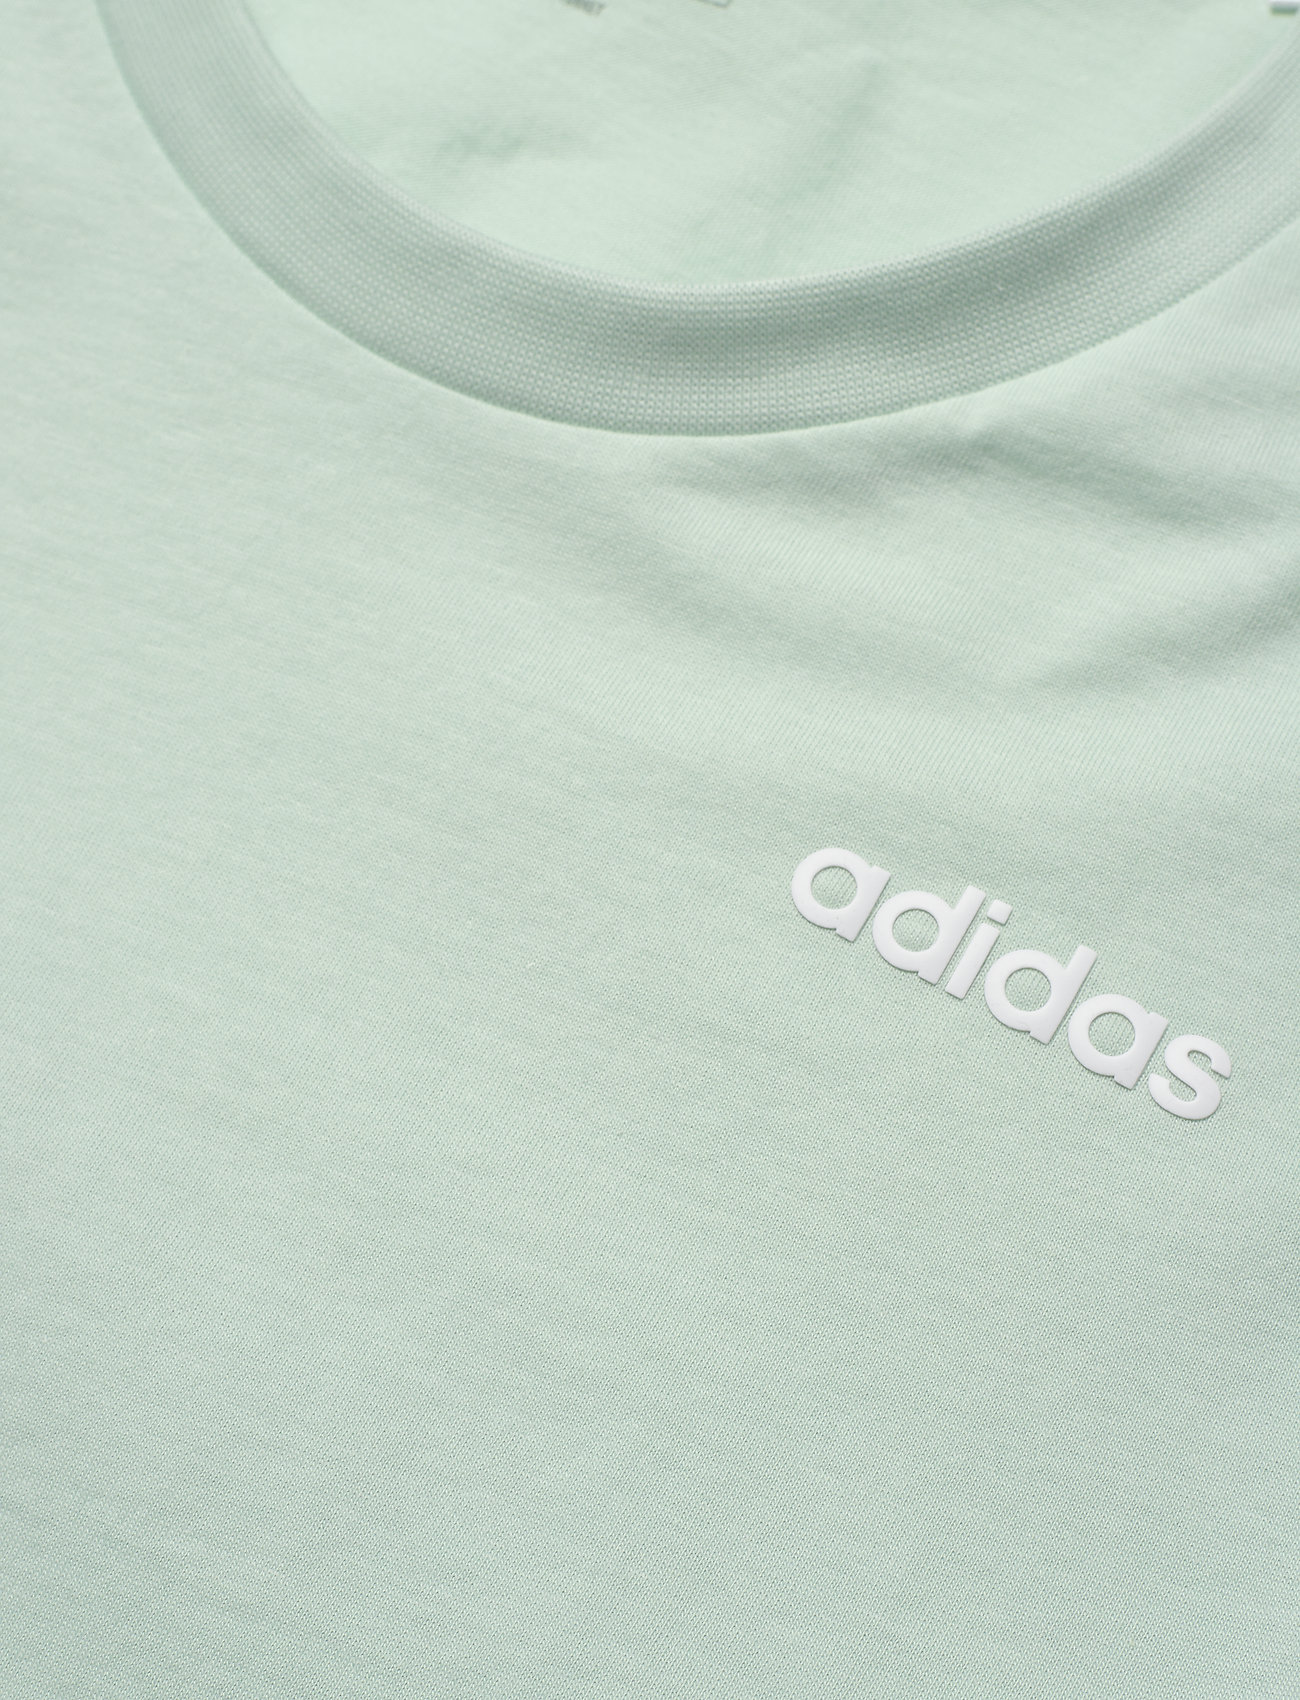 W E 3s Slim Tee (Grntnt/white) (174.30 kr) - adidas Performance